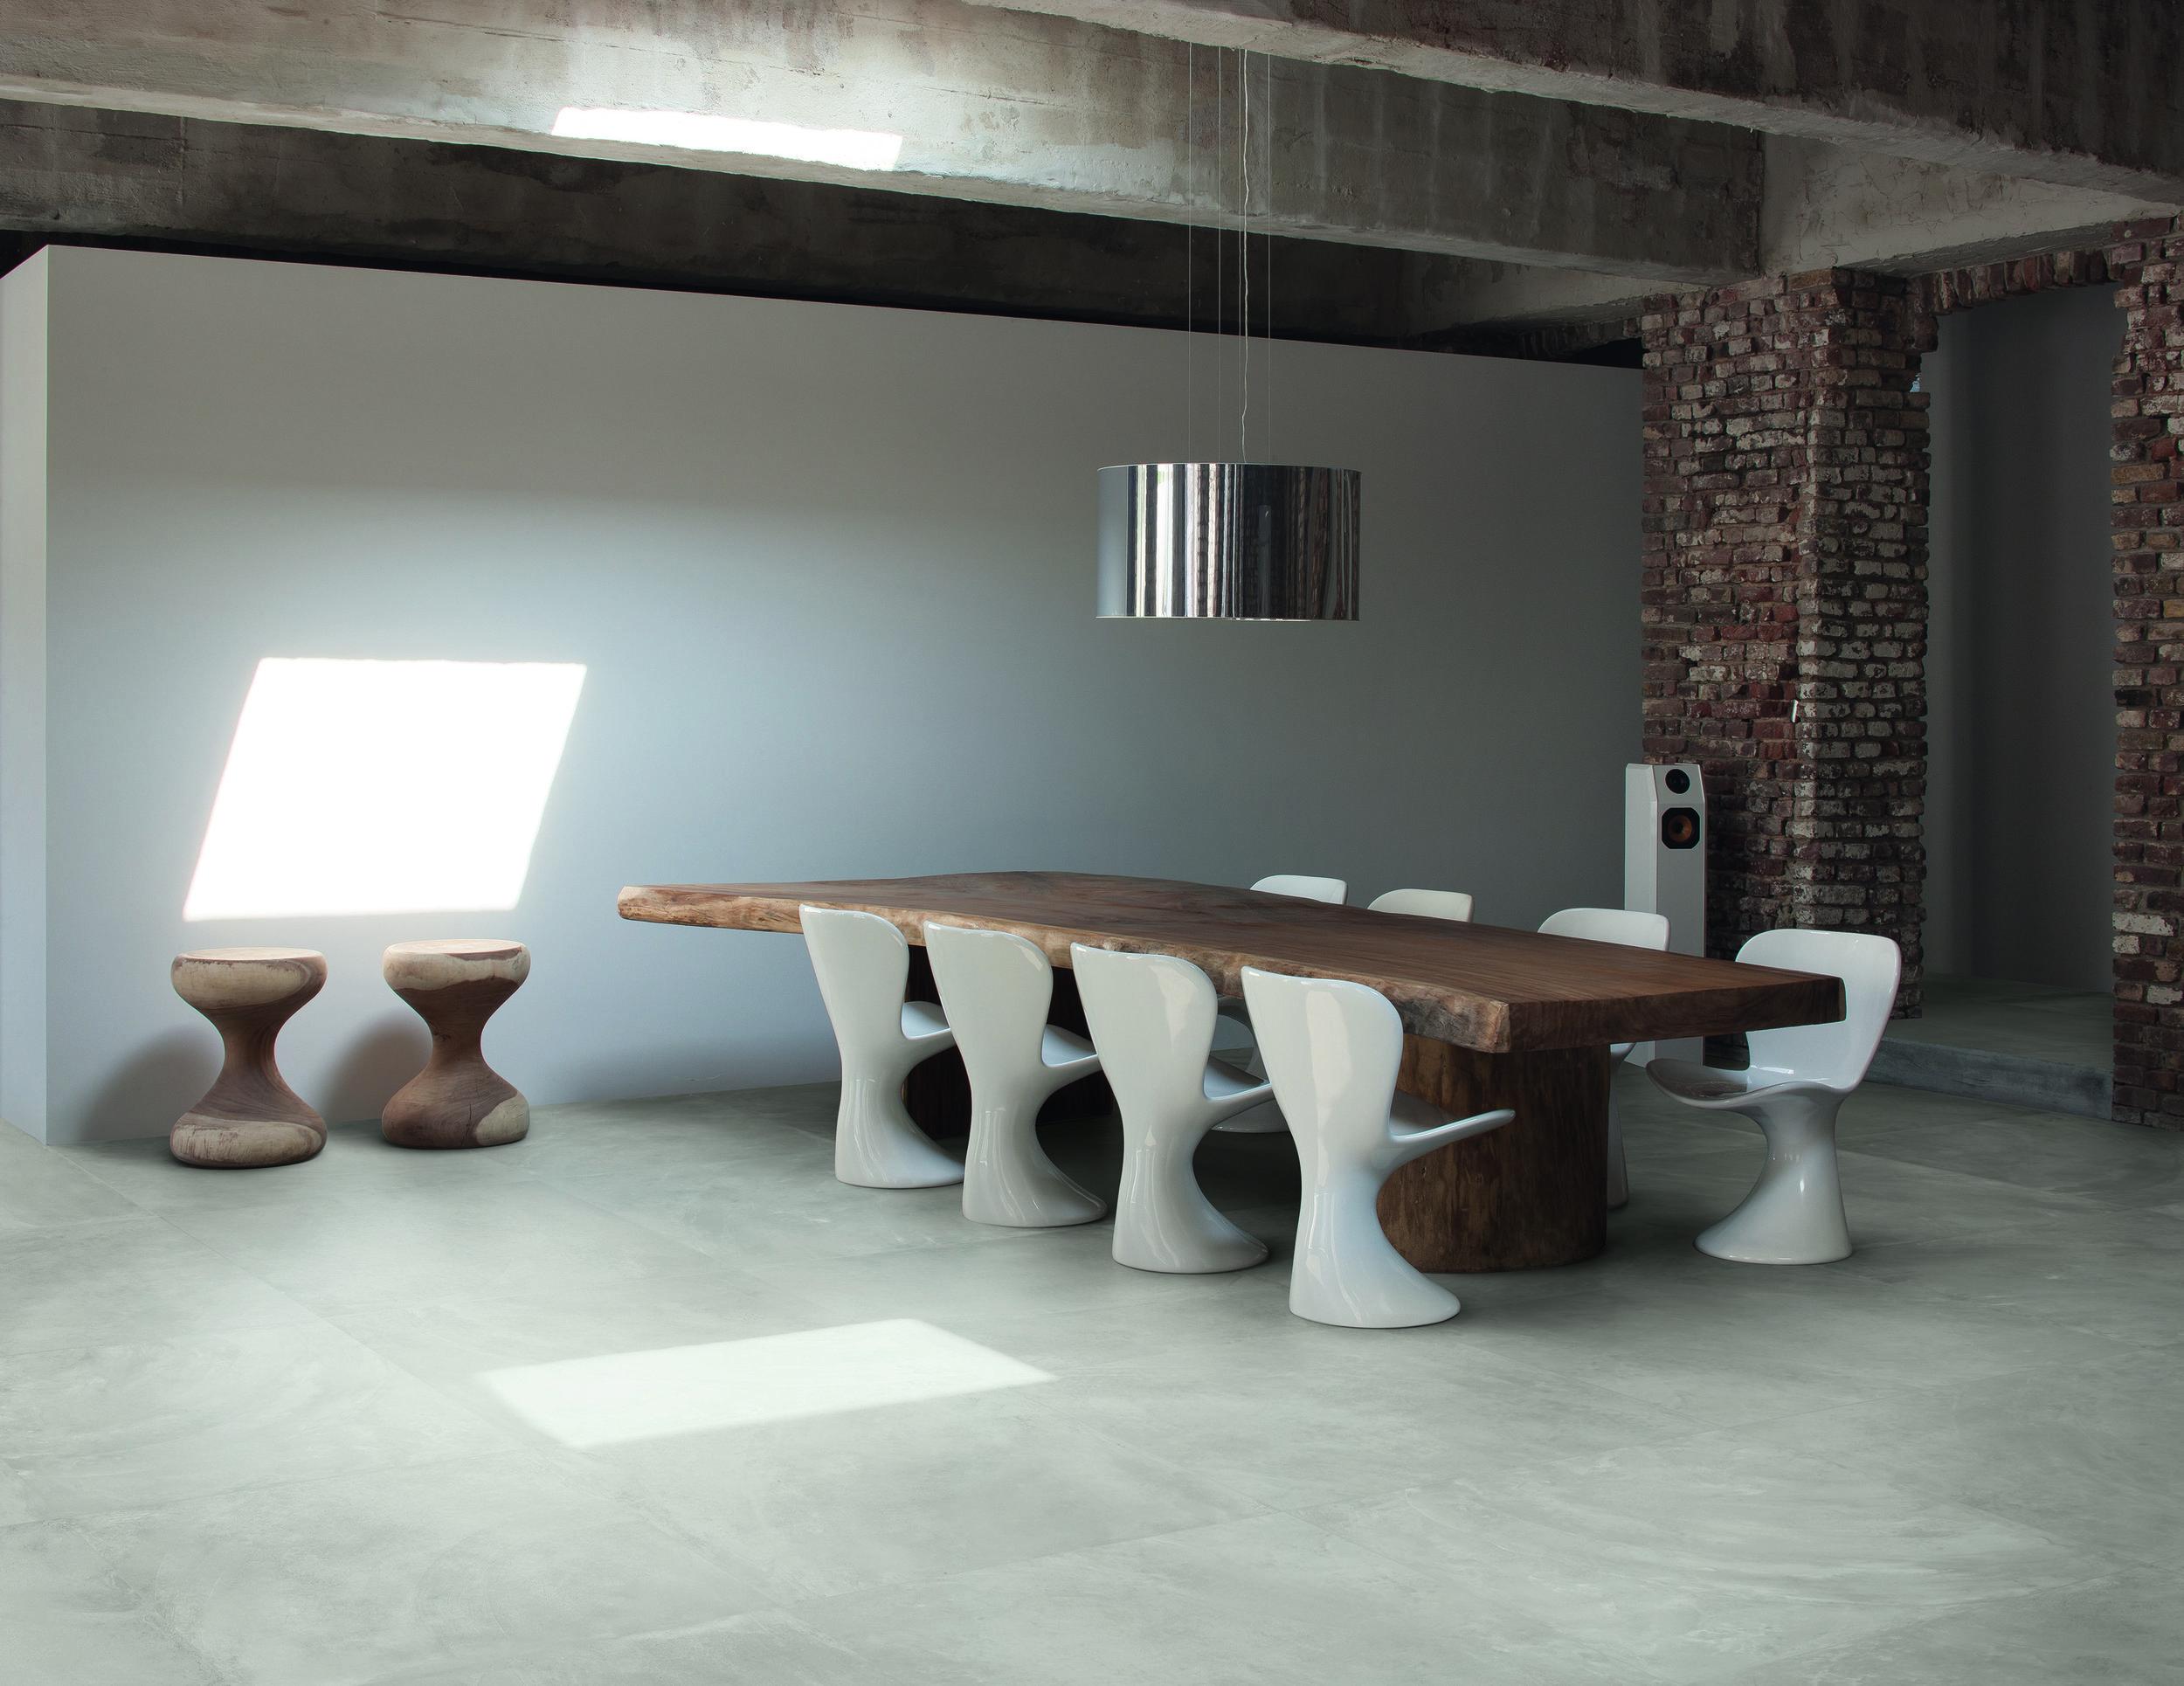 Architect Berlin Grey nat 80x80 Amb living.jpg